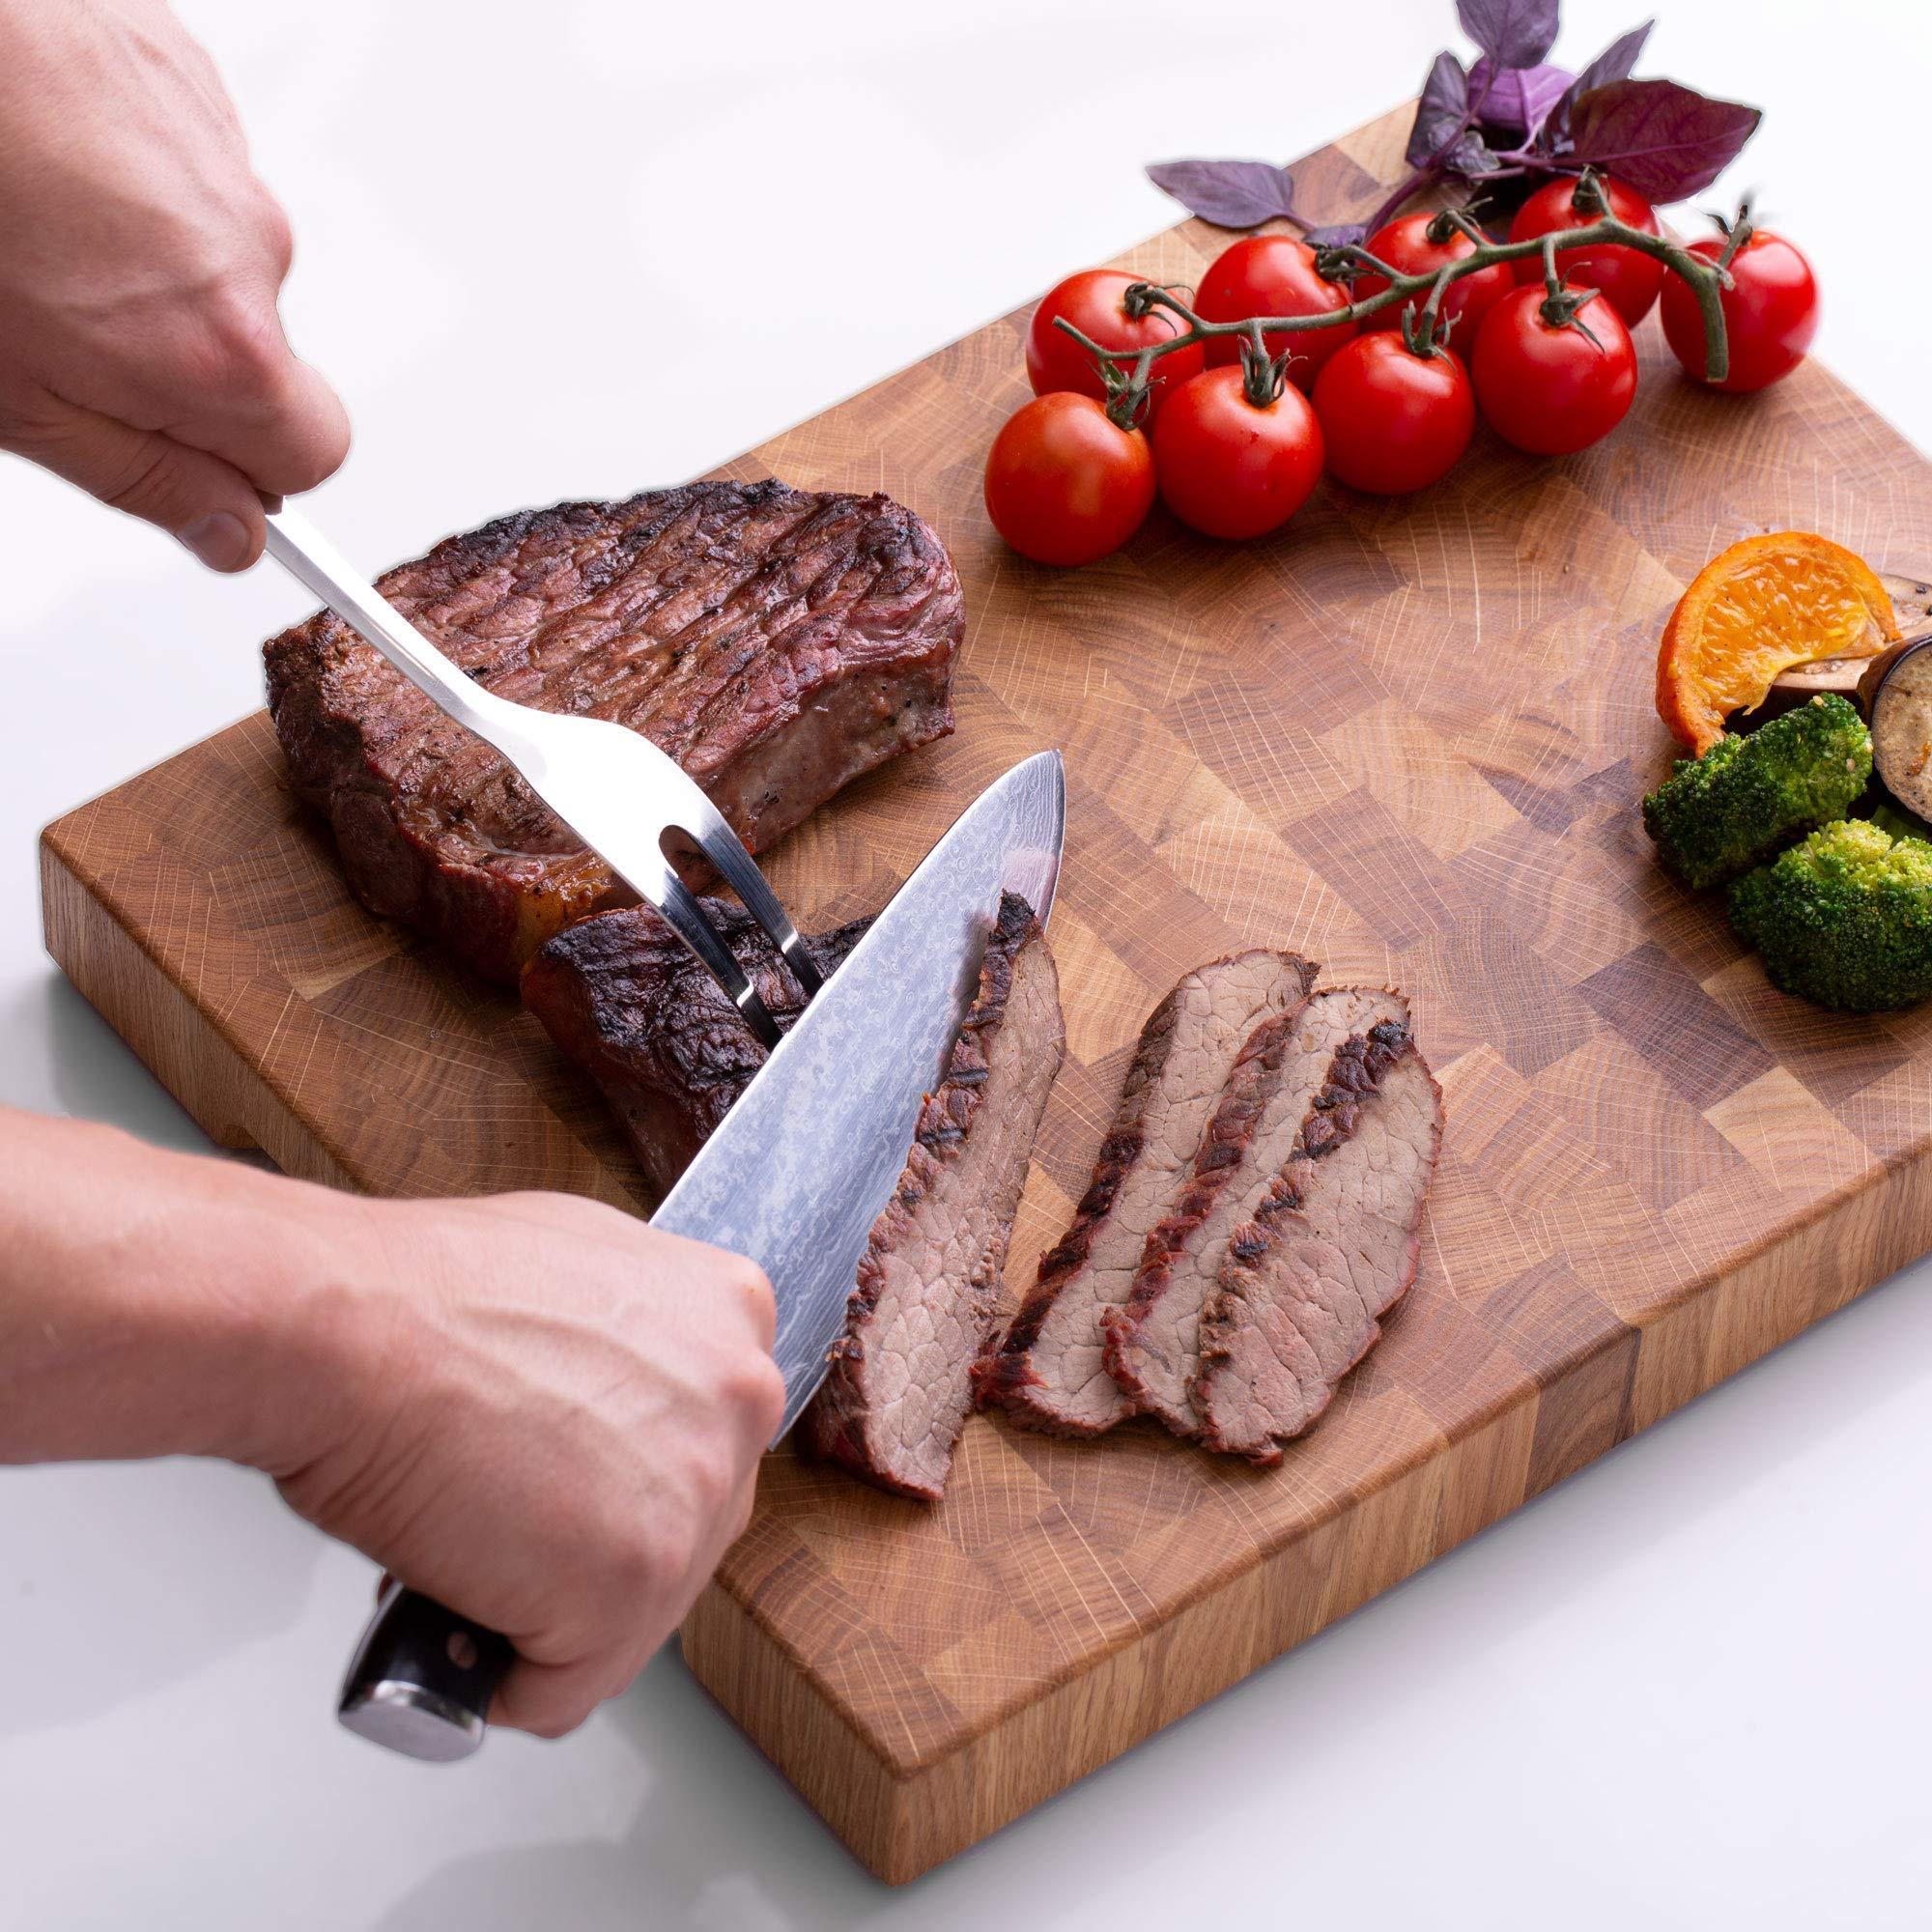 End Grain Wood cutting board - Wood Chopping block - Large cutting board 16 x 12 Kitchen butcher block Oak cutting board non slip cutting board with feet - Kitchen Wooden chopping board by TPA Wood (Image #6)